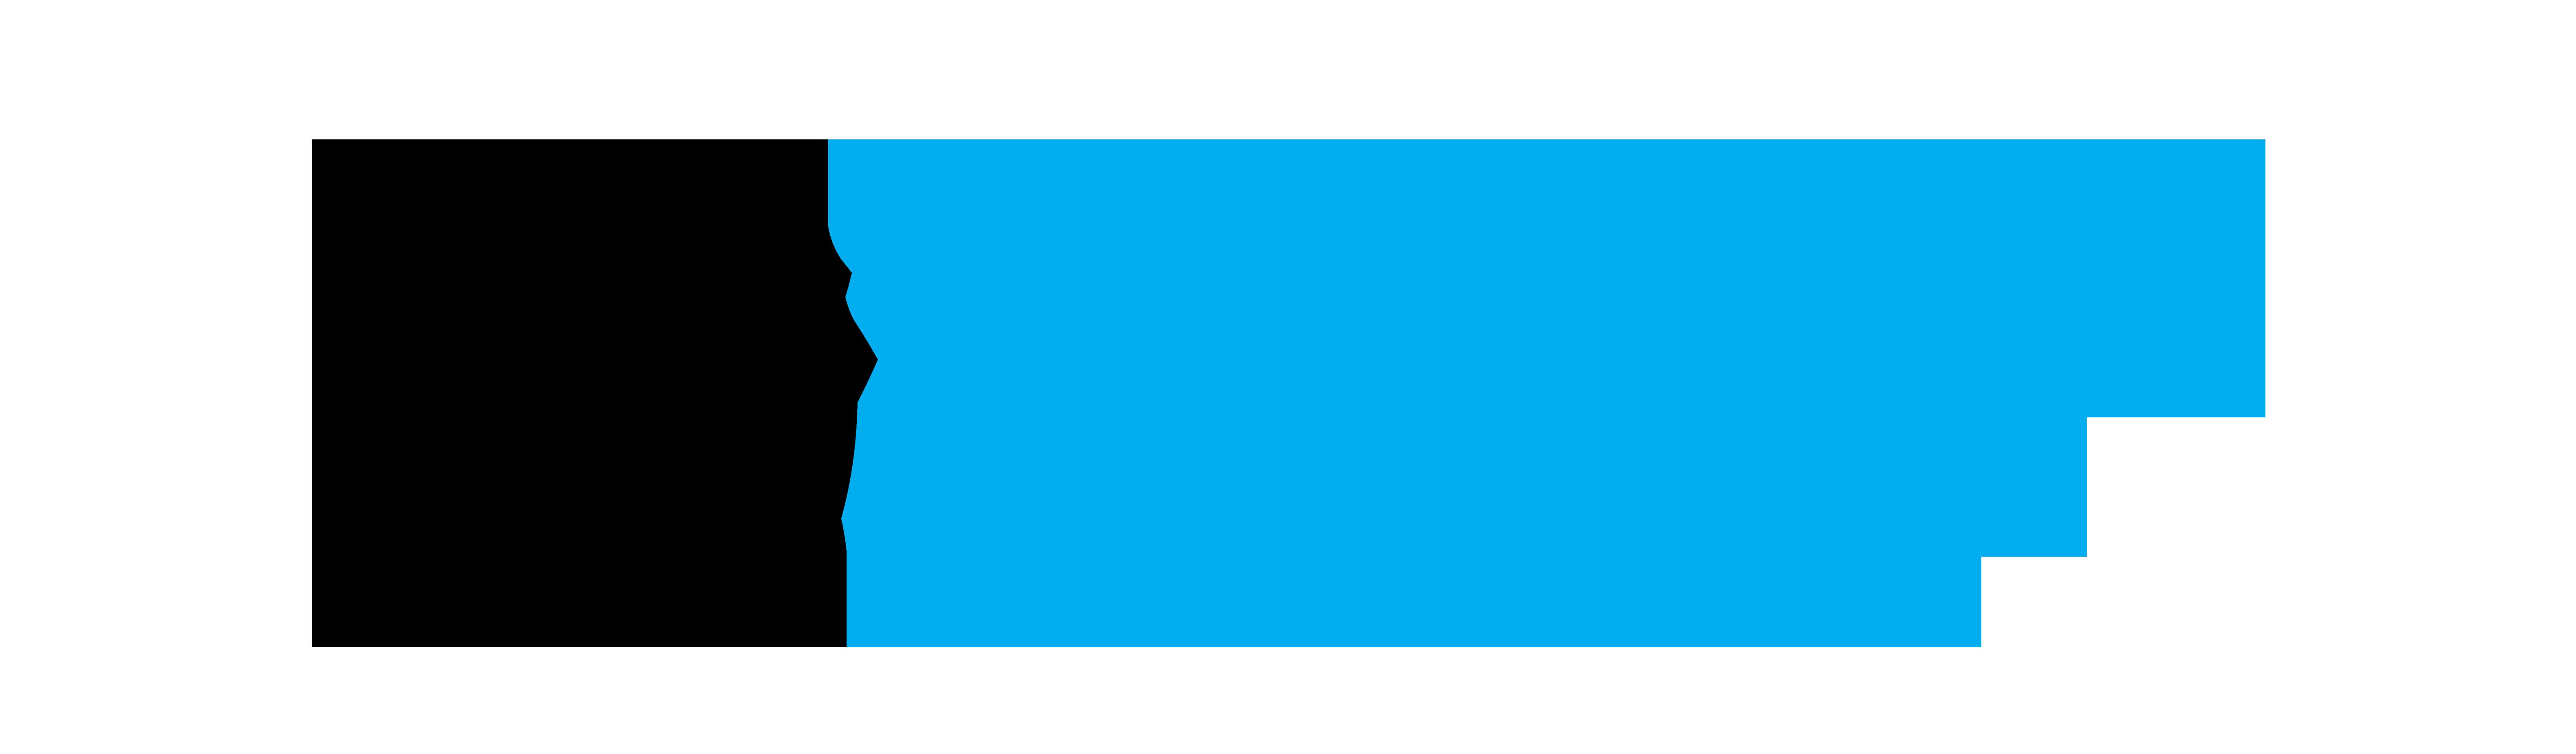 smart_infrastructure_hub_logo2